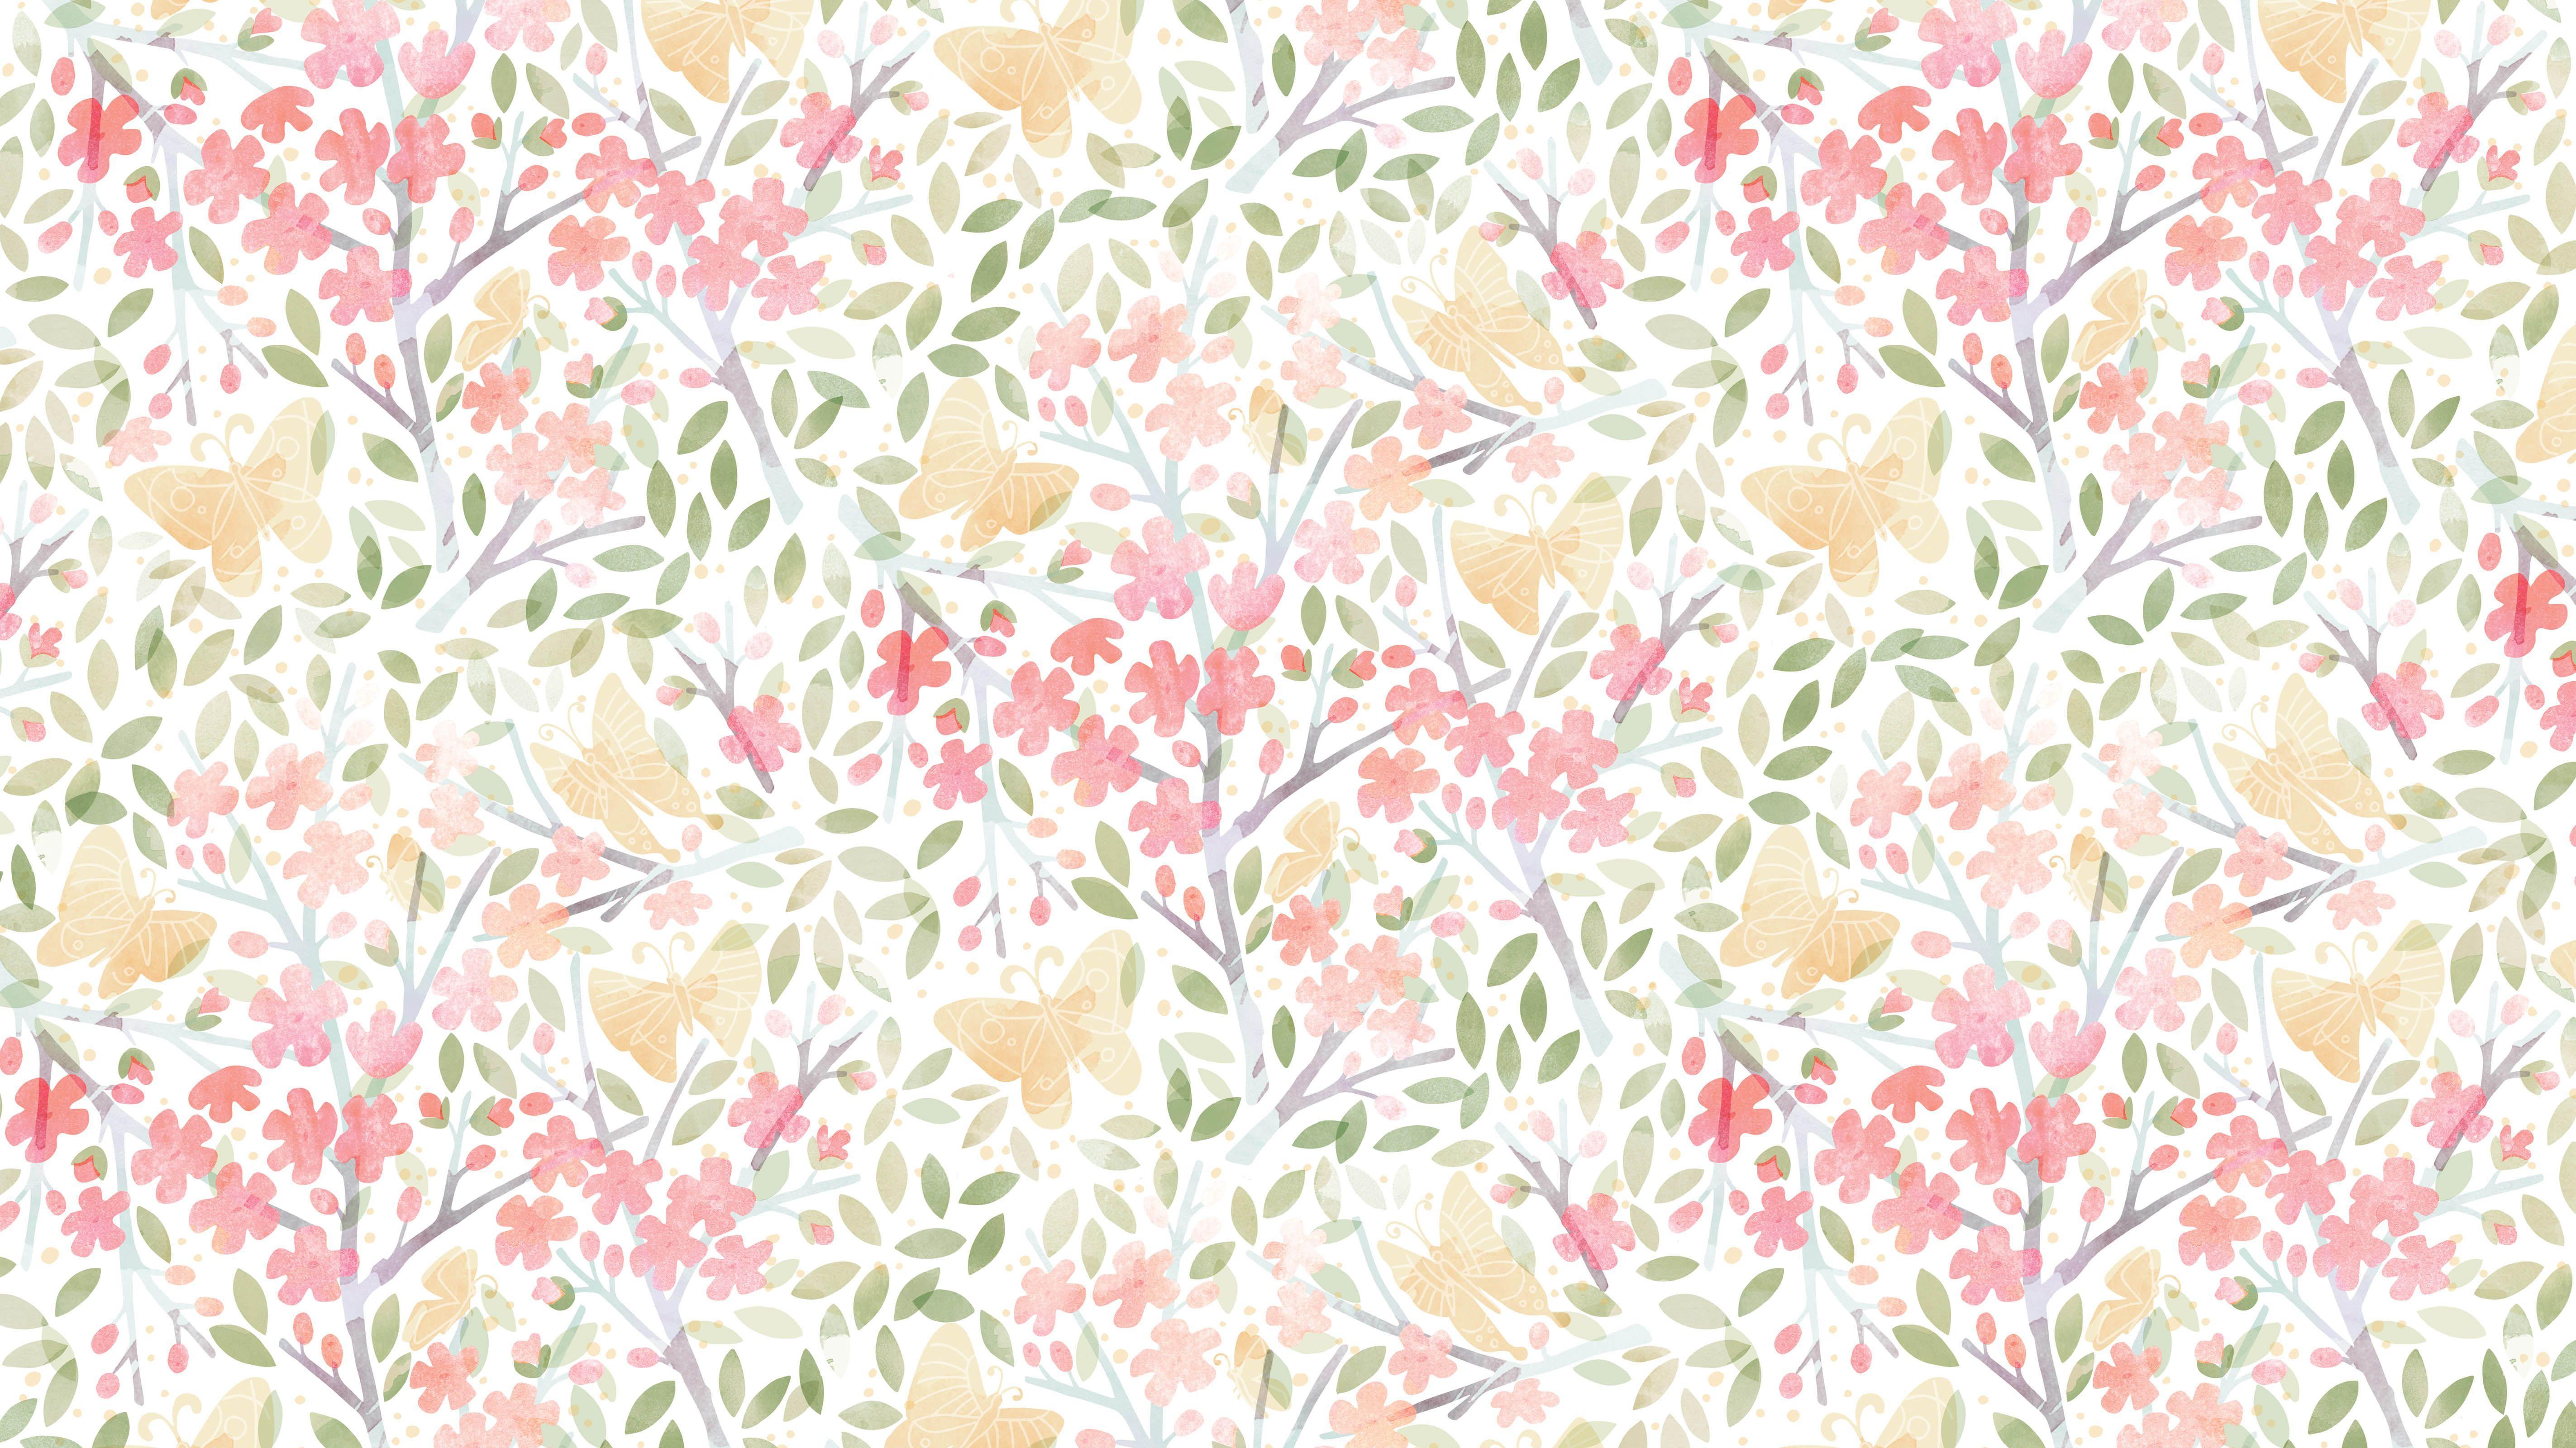 Kate Spade Desktop Wallpaper Fall Wallpapers 2016 Desktop Wallpaper Cave